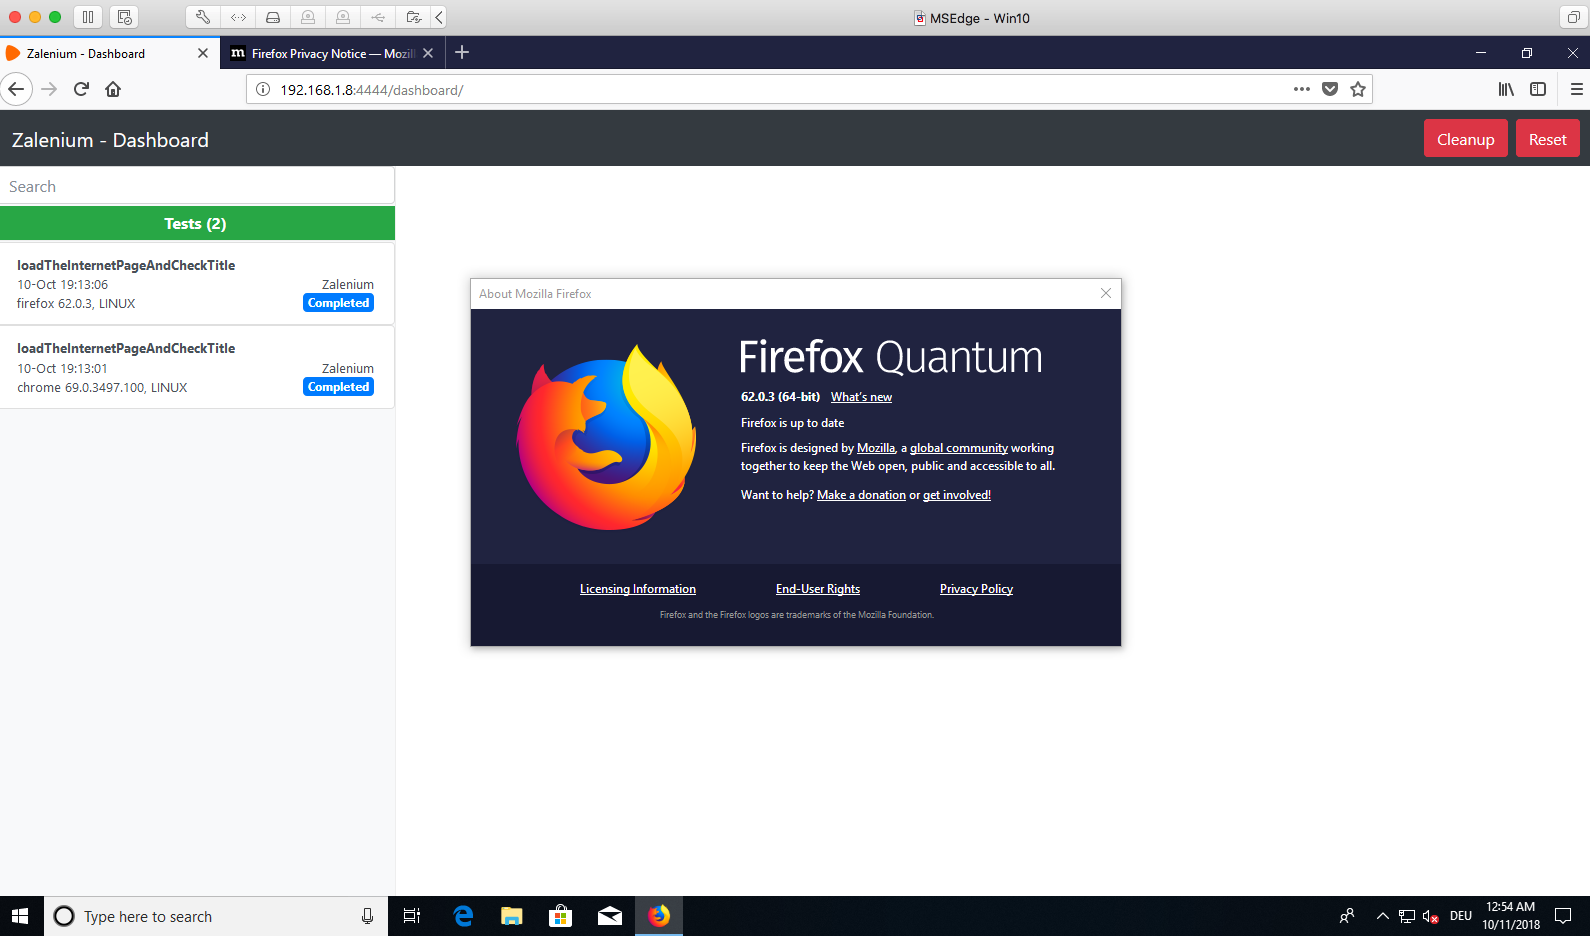 Test script status issue on Zalenium dashboard for Firefox